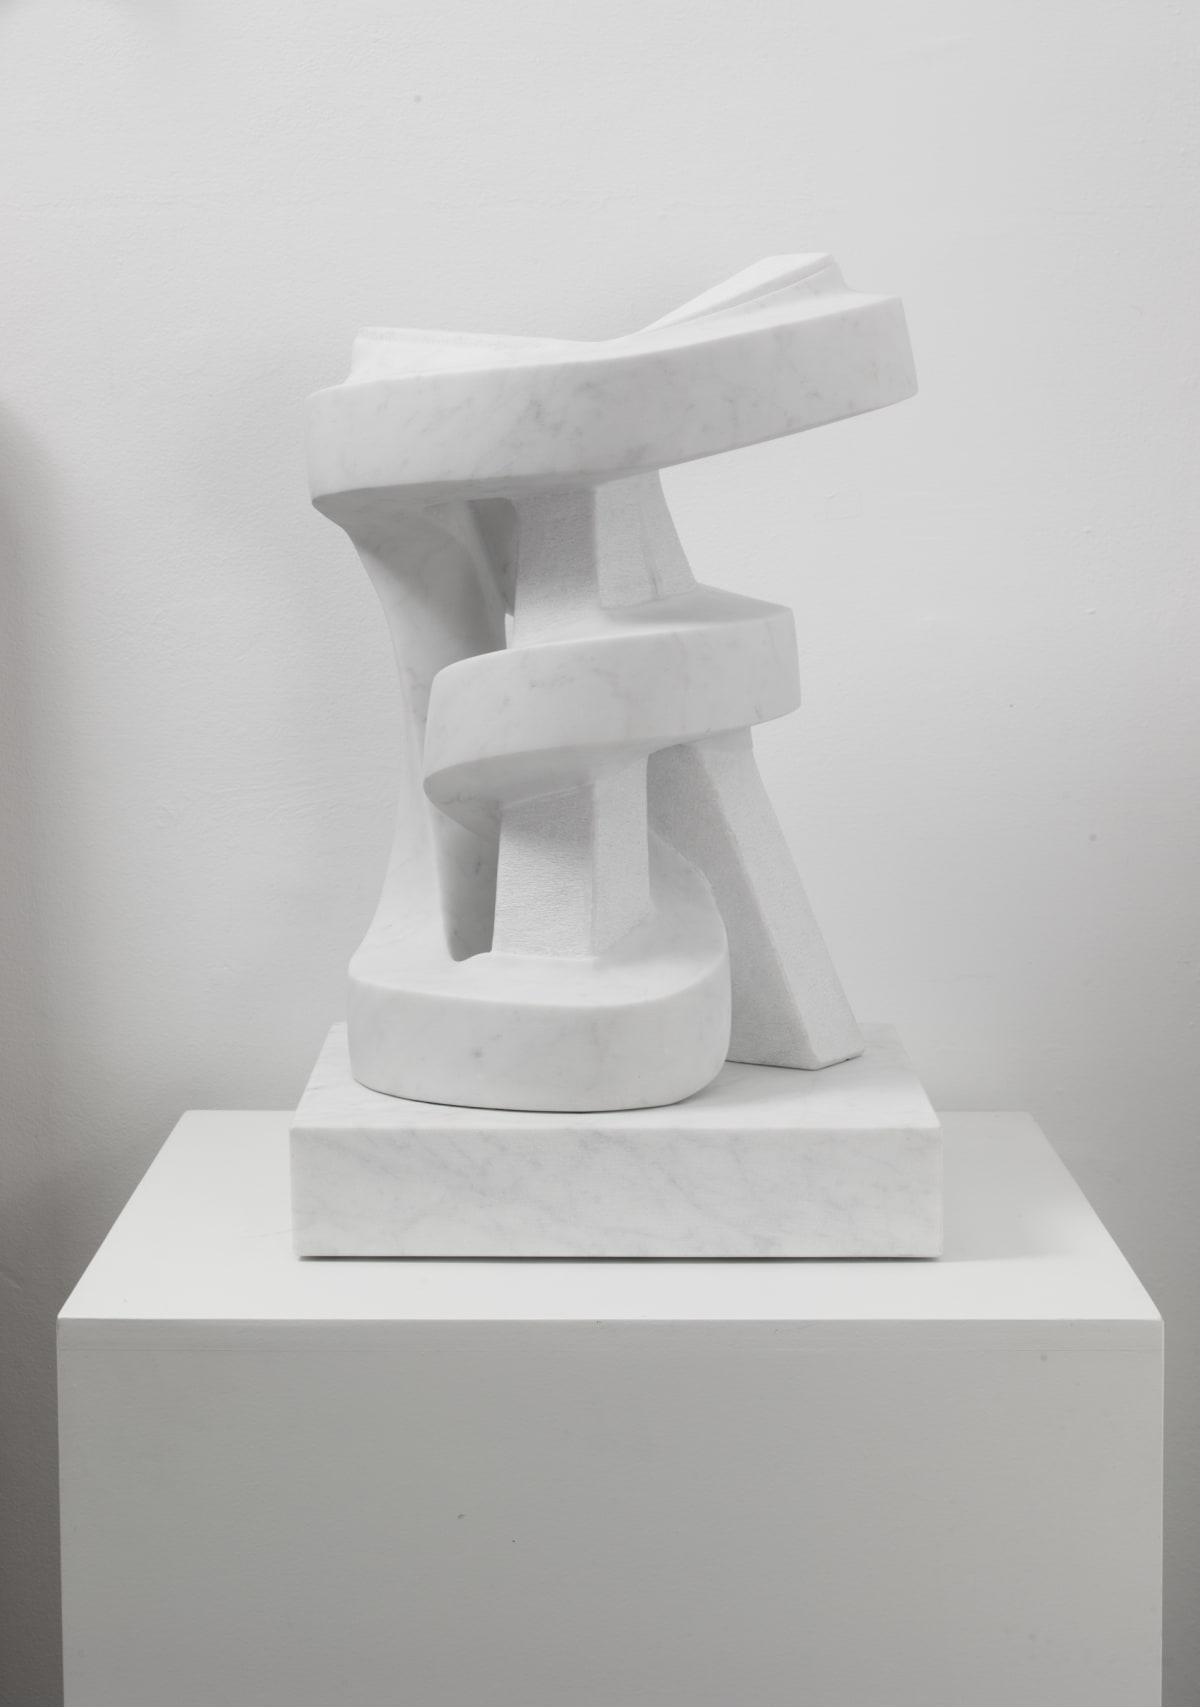 Paul Bloch, La Nascita, 2014